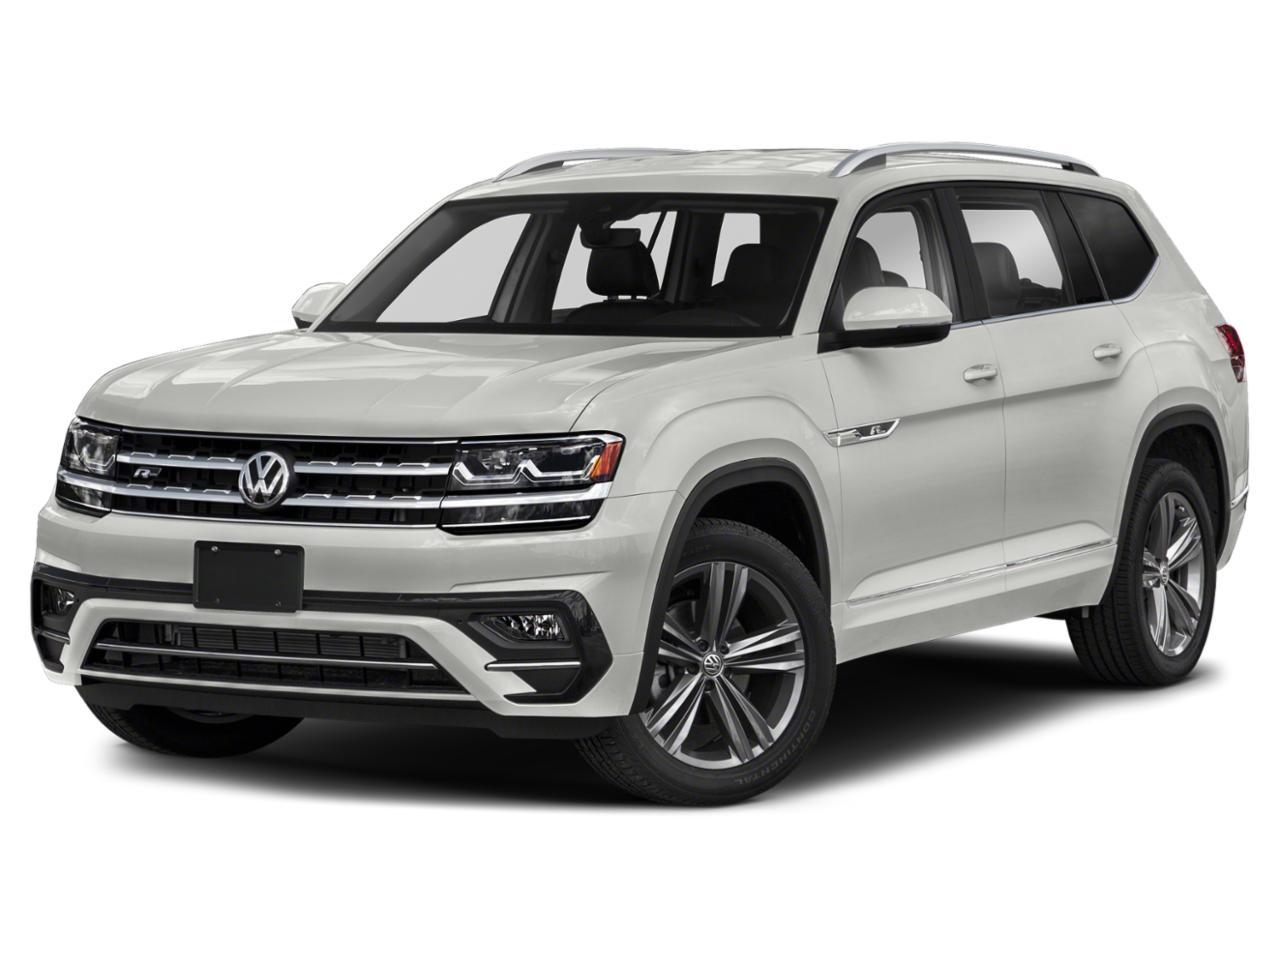 2019 Volkswagen Atlas Vehicle Photo in San Antonio, TX 78257